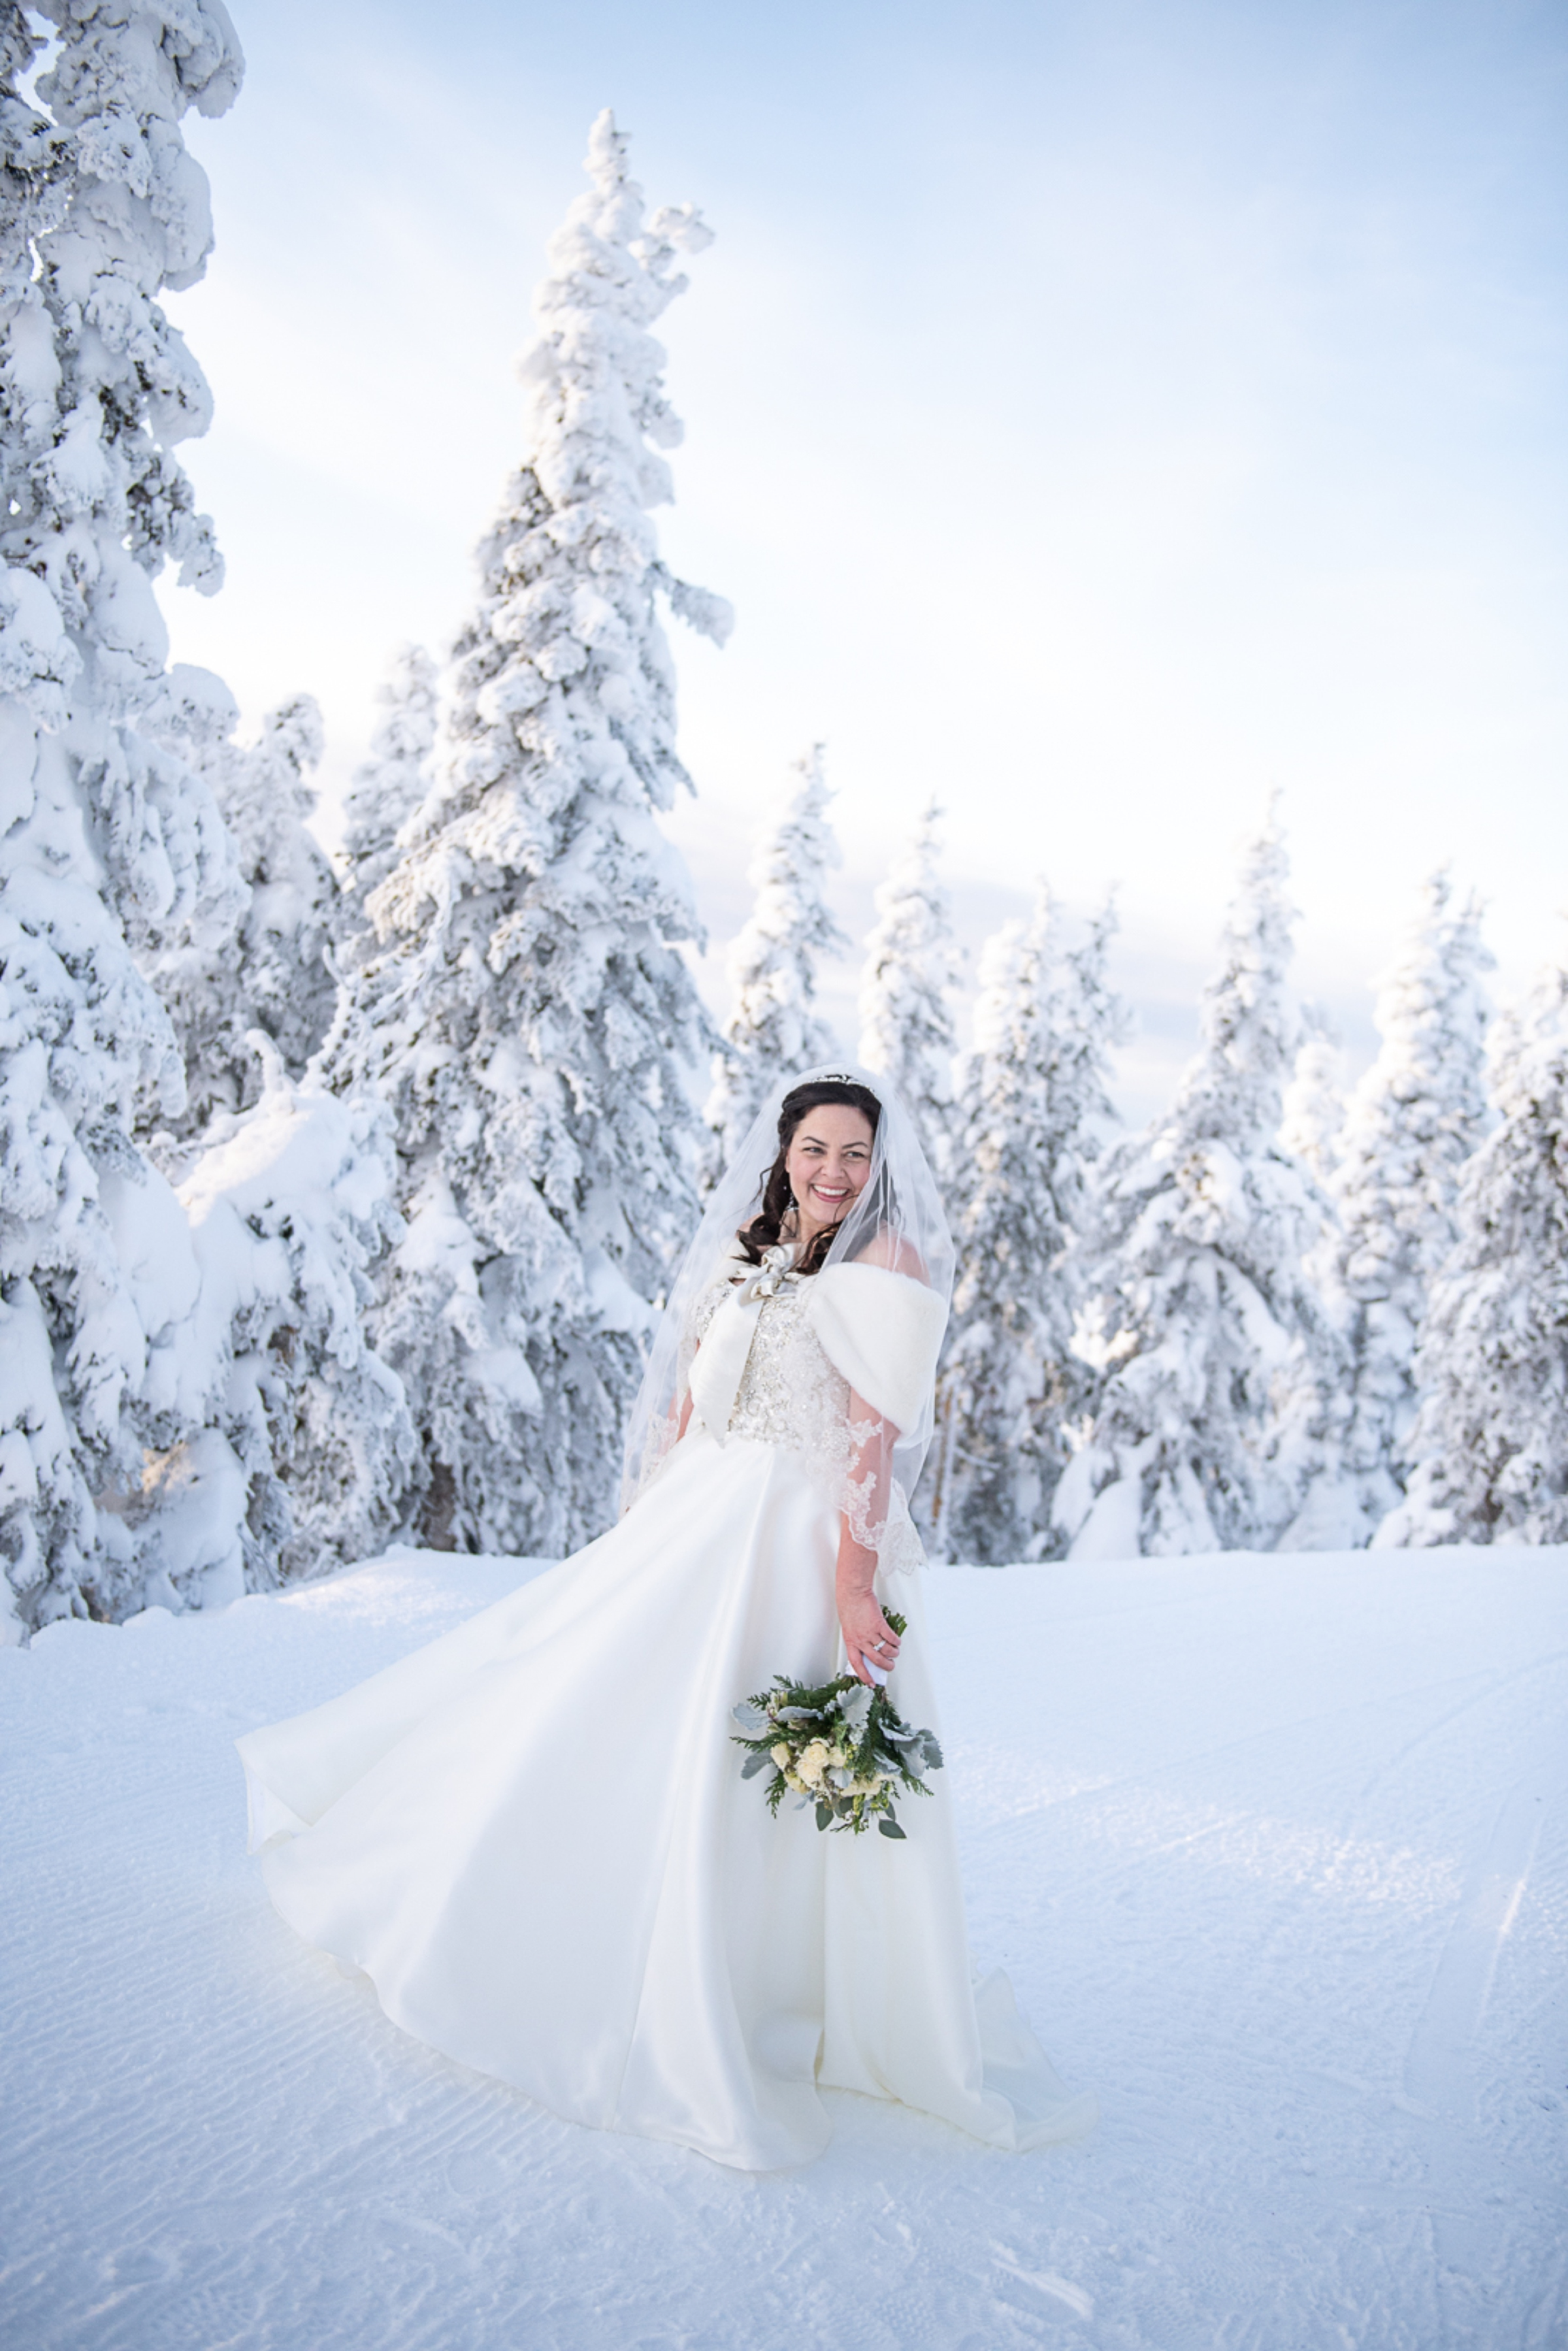 Janel-Gion-Wedding-Photographer-KristinRon-Sandpoint-Idaho.jpg_0020.jpg